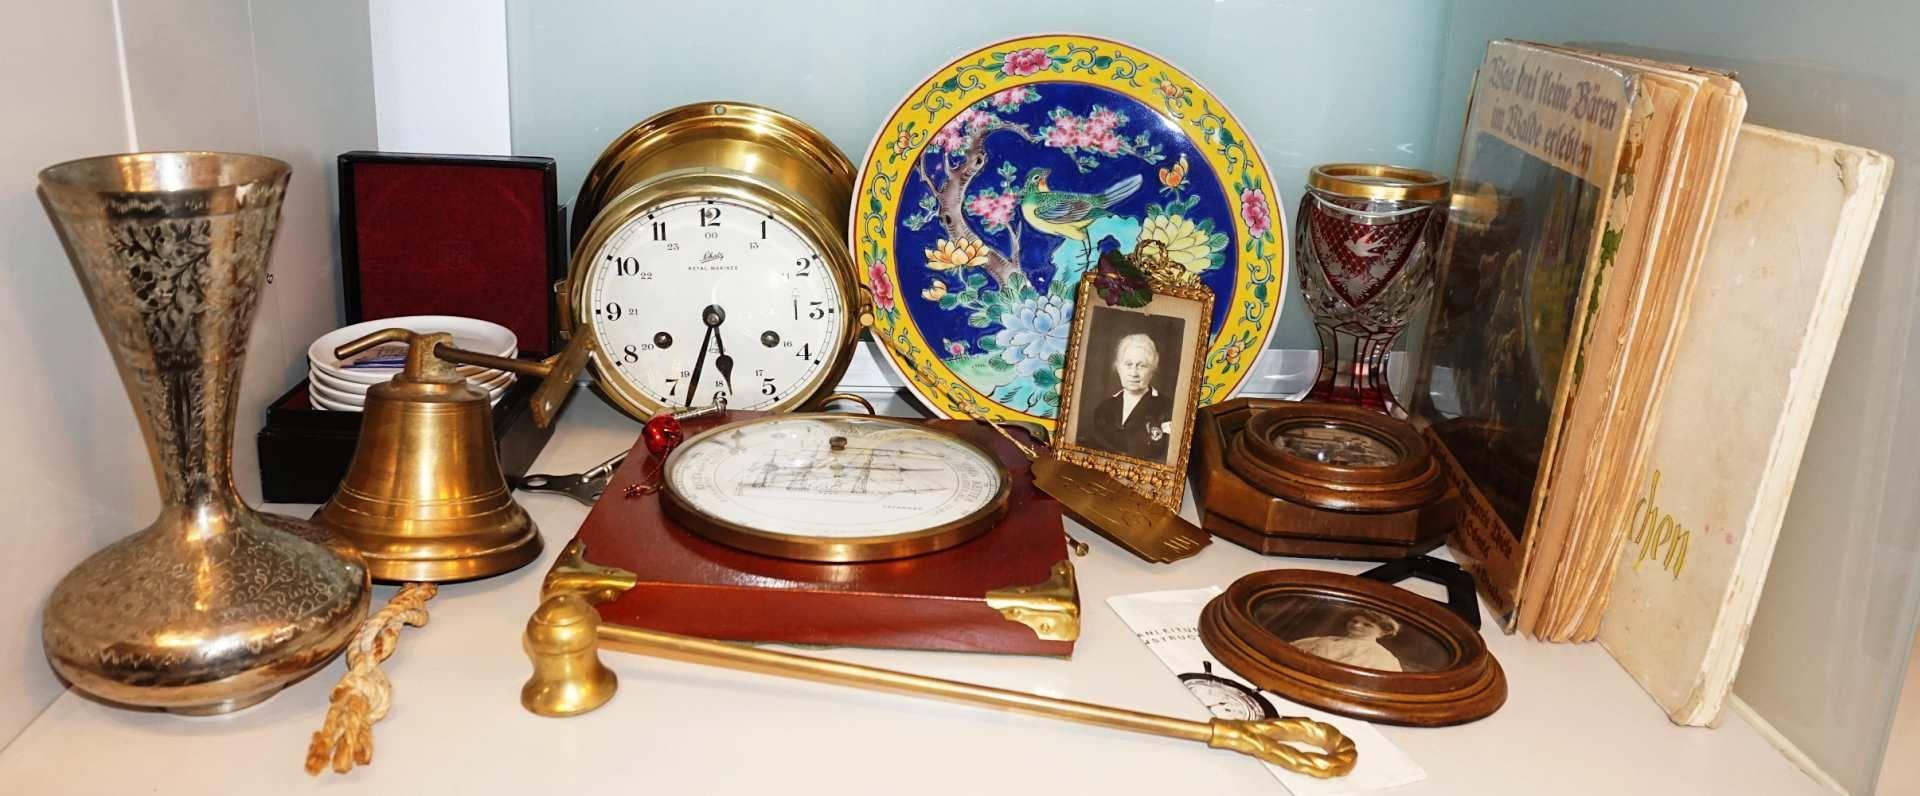 "1 Konv. Dekorationsobjekte u.a., z.T. Anfang 20. Jh.: Glasen-Uhr SCHATZ ""Royal Marin"